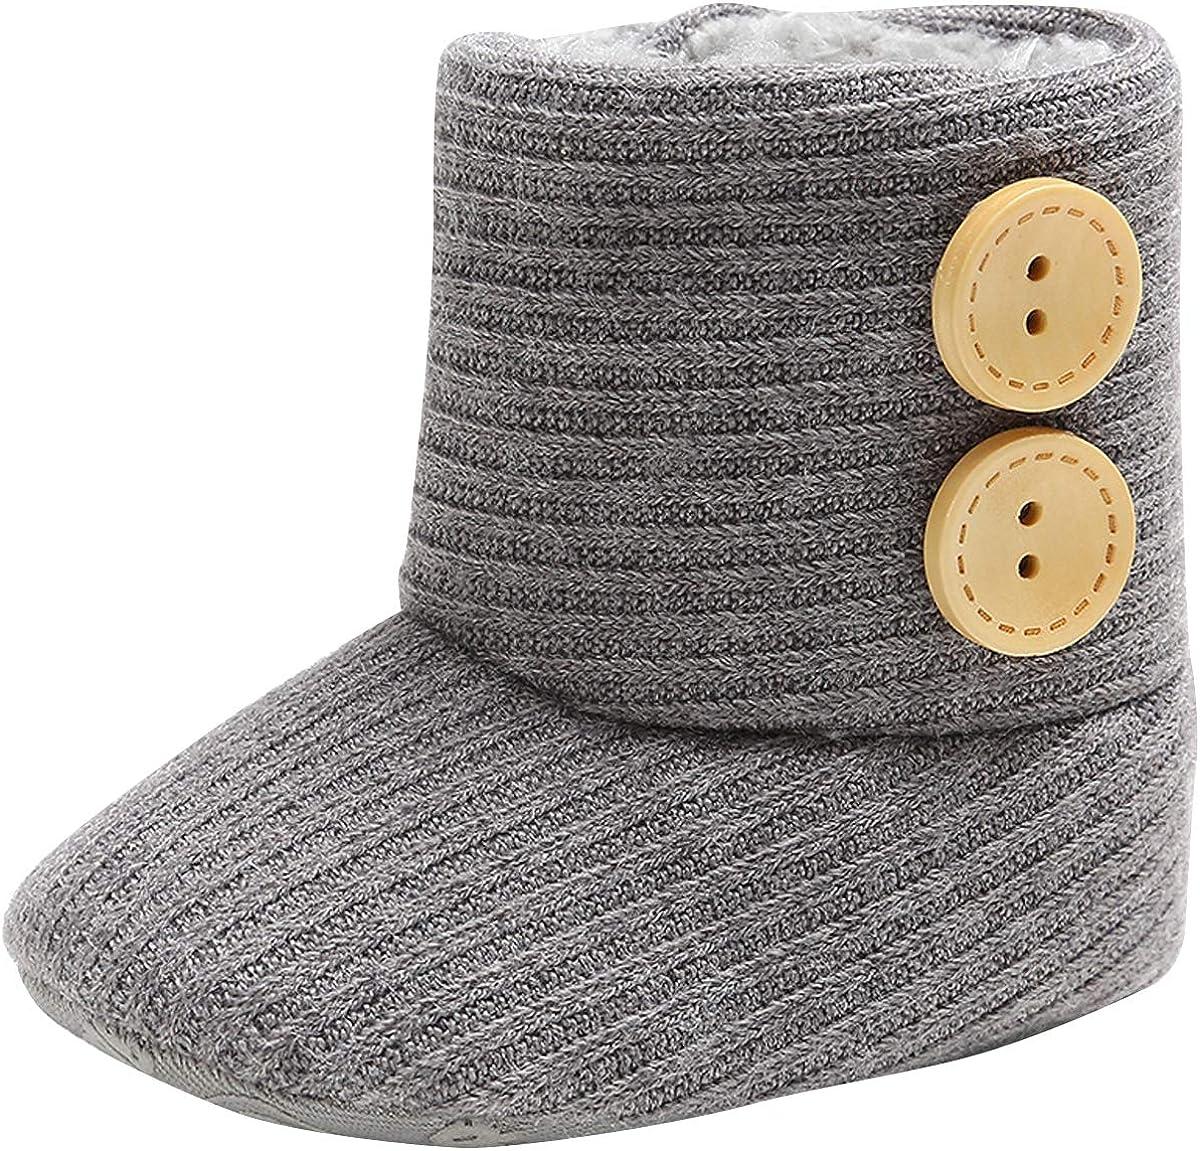 vanberfia Unisex Baby Soft Sole Snow Boots Infant Warm Winter for 0-18 Months